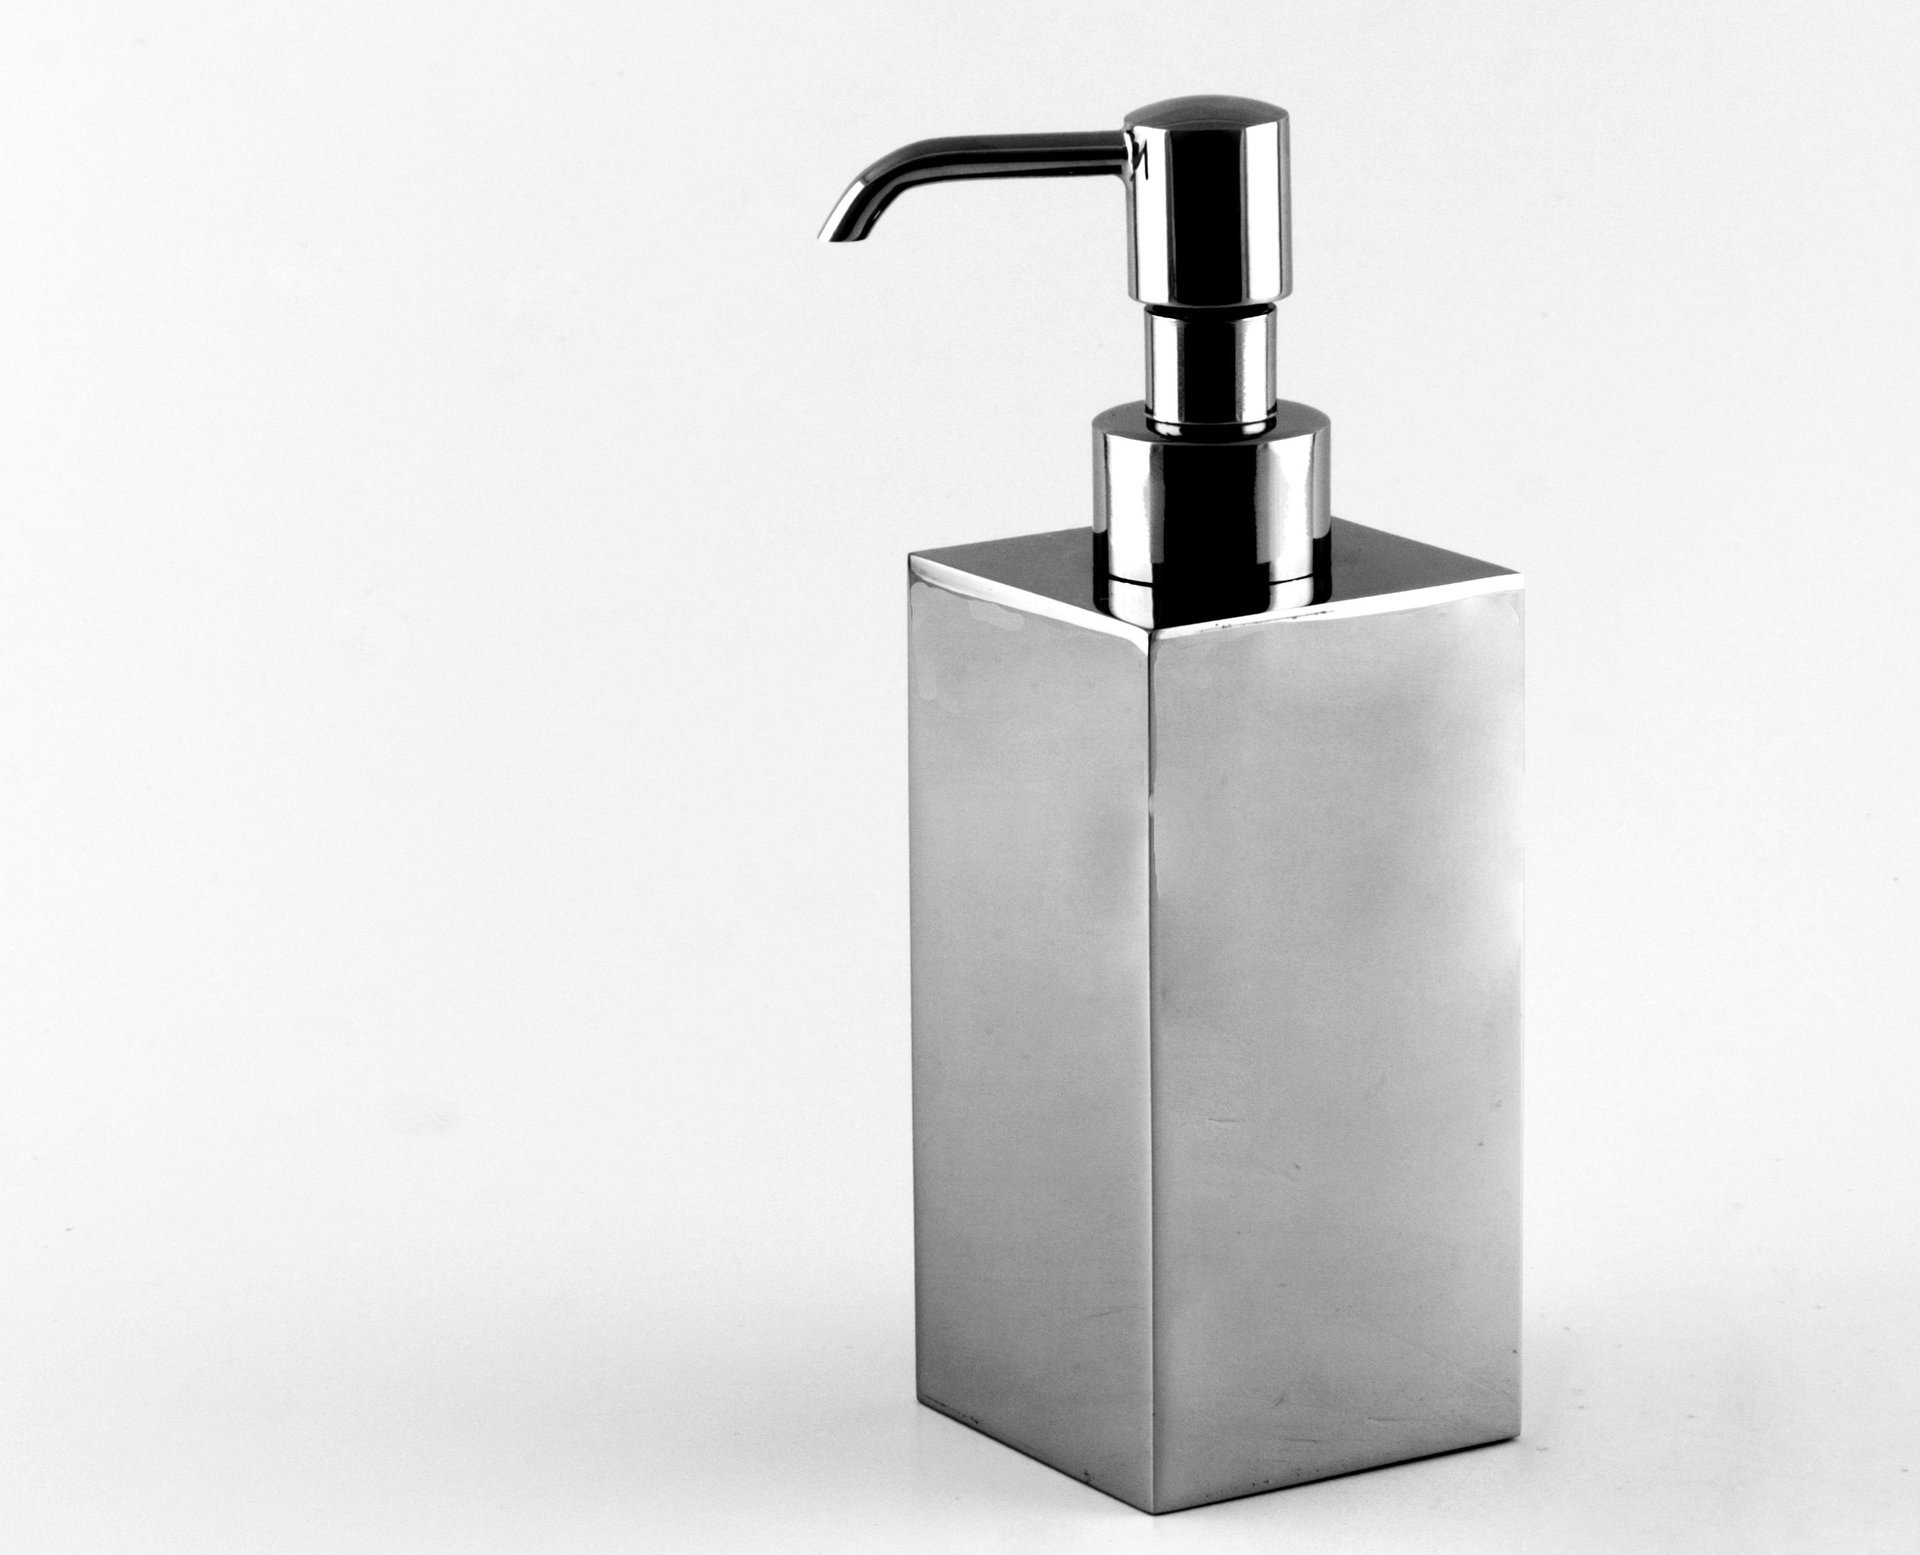 Bathroom accessories - Florence - Studio Anichini